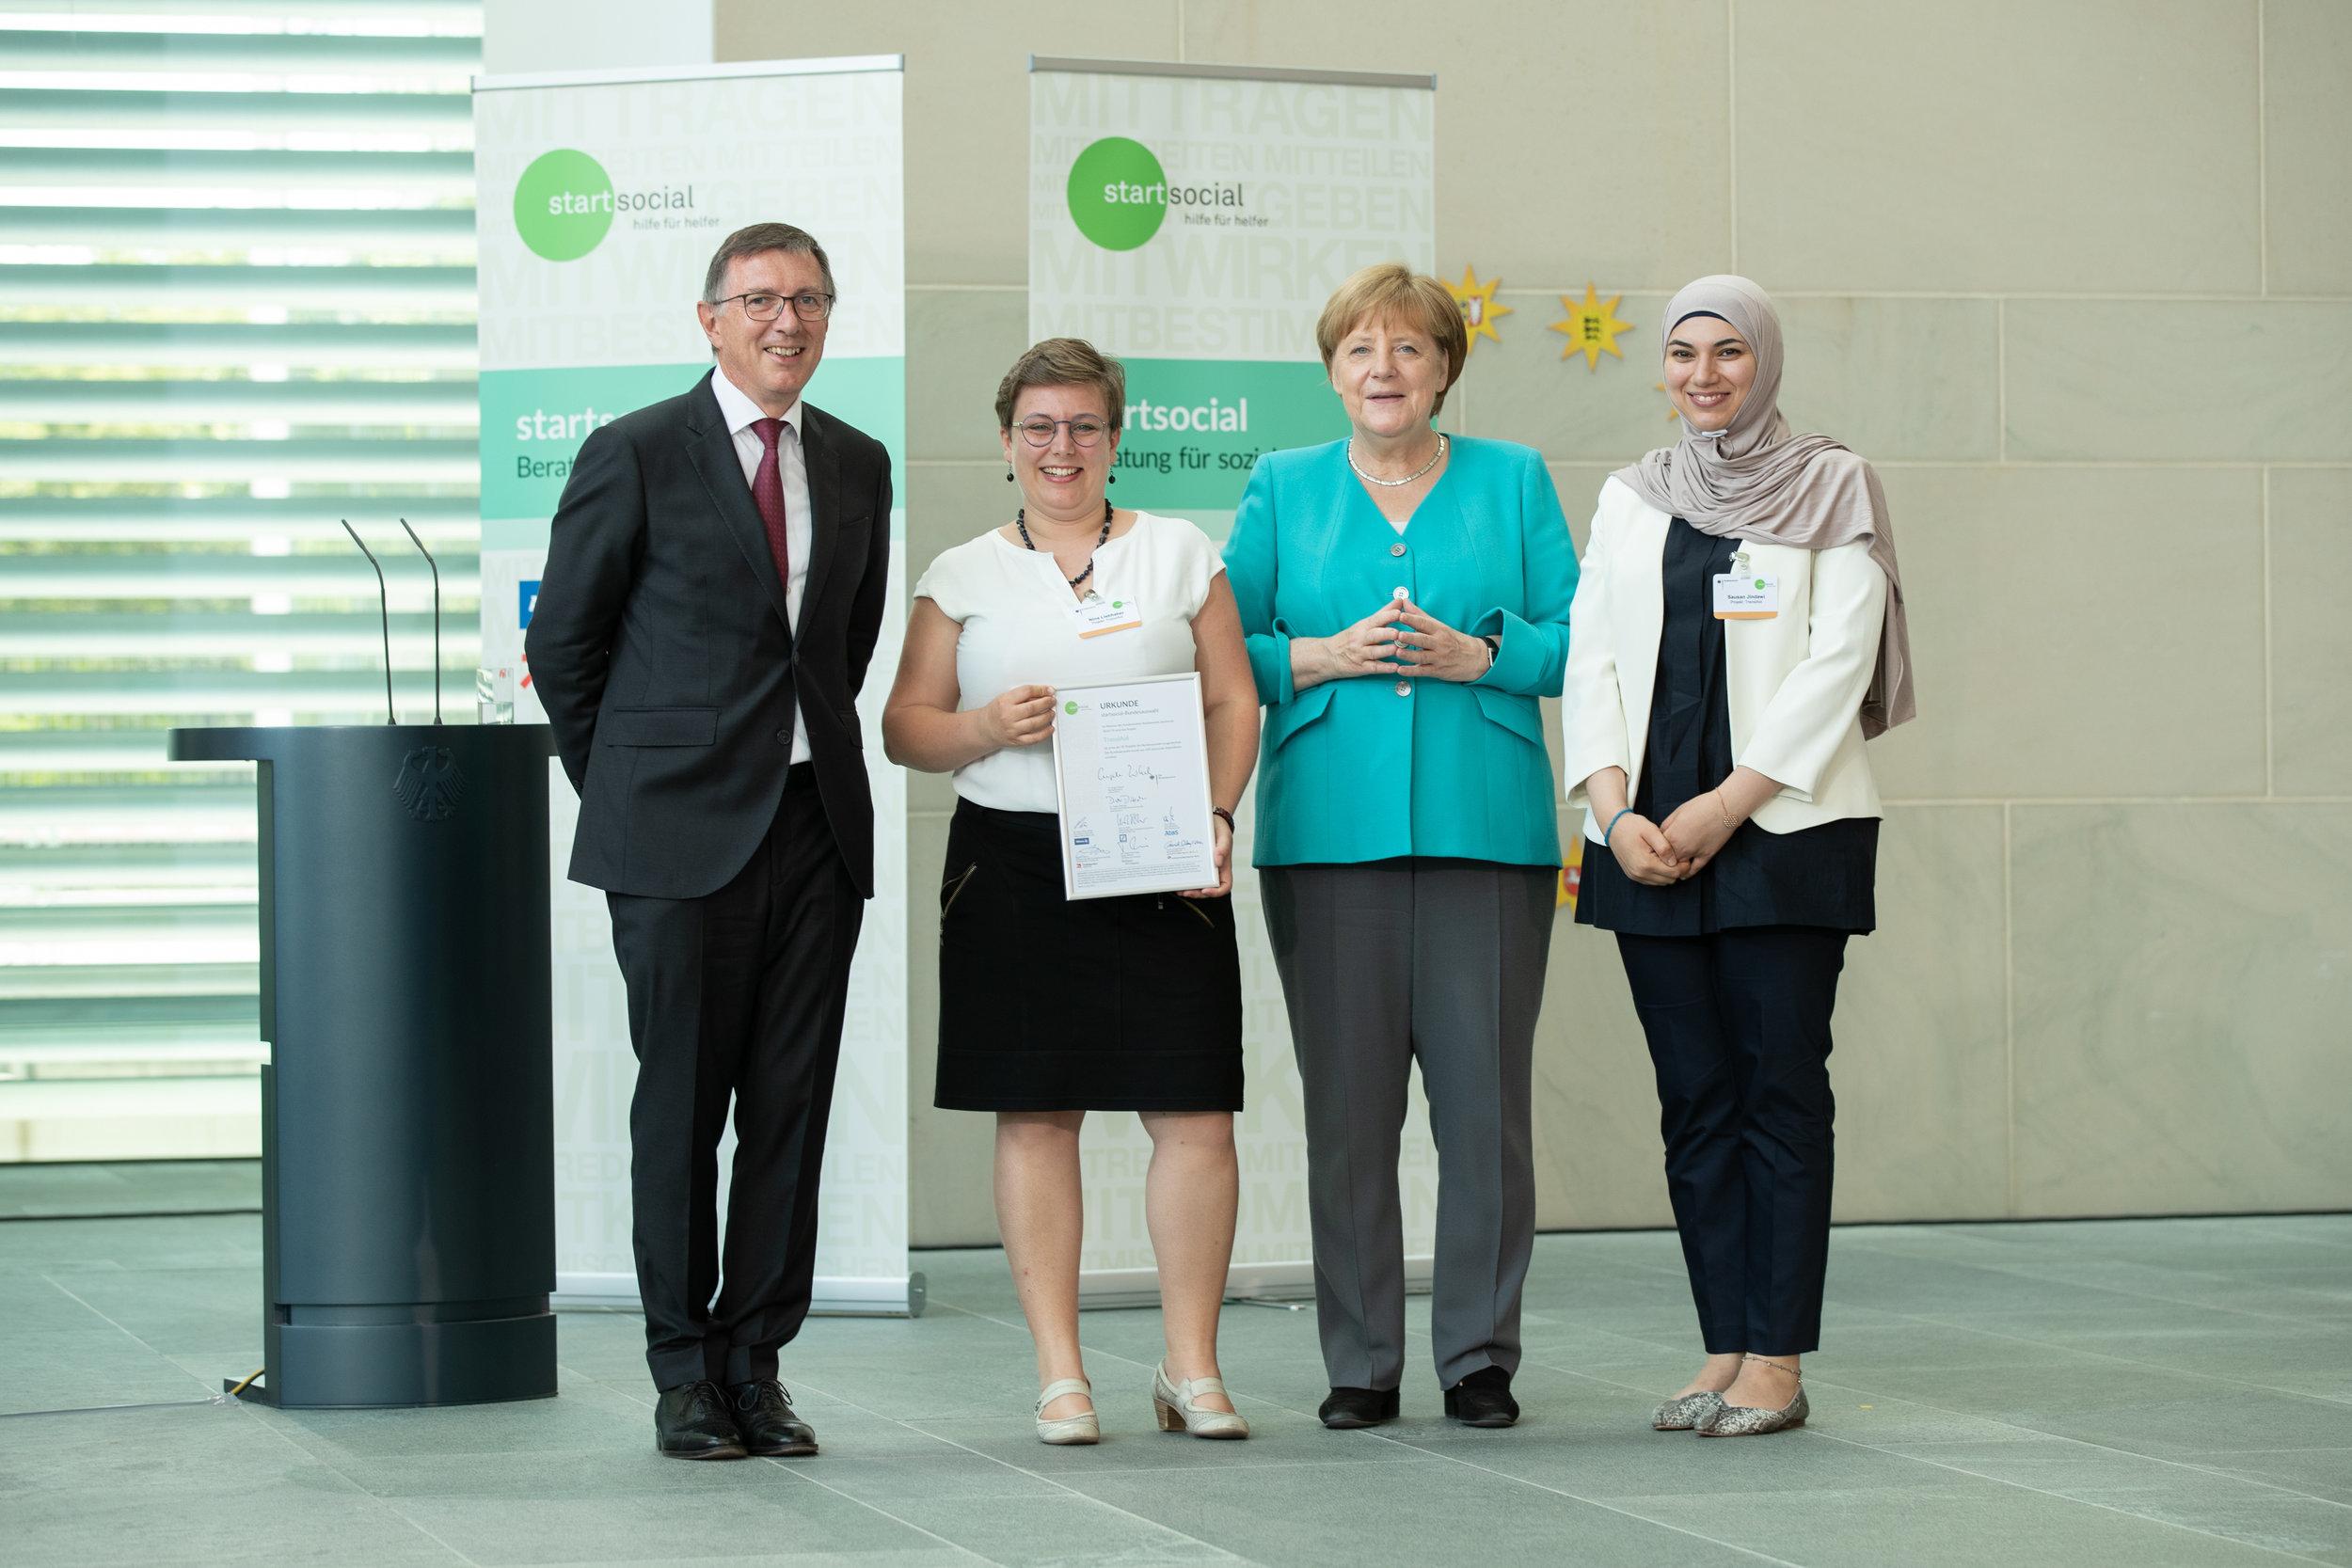 ©startsocial e.V./Thomas Effinger  von links nach rechts: Dr. Dieter Düsedau (Gründer von startsocial e.V.), Nina Liebhaber (TranslAid), Bundeskanzlerin Angela Merkel (Schirmherrin von startsocial e.V.), Sausan Jindawi (TranslAid)